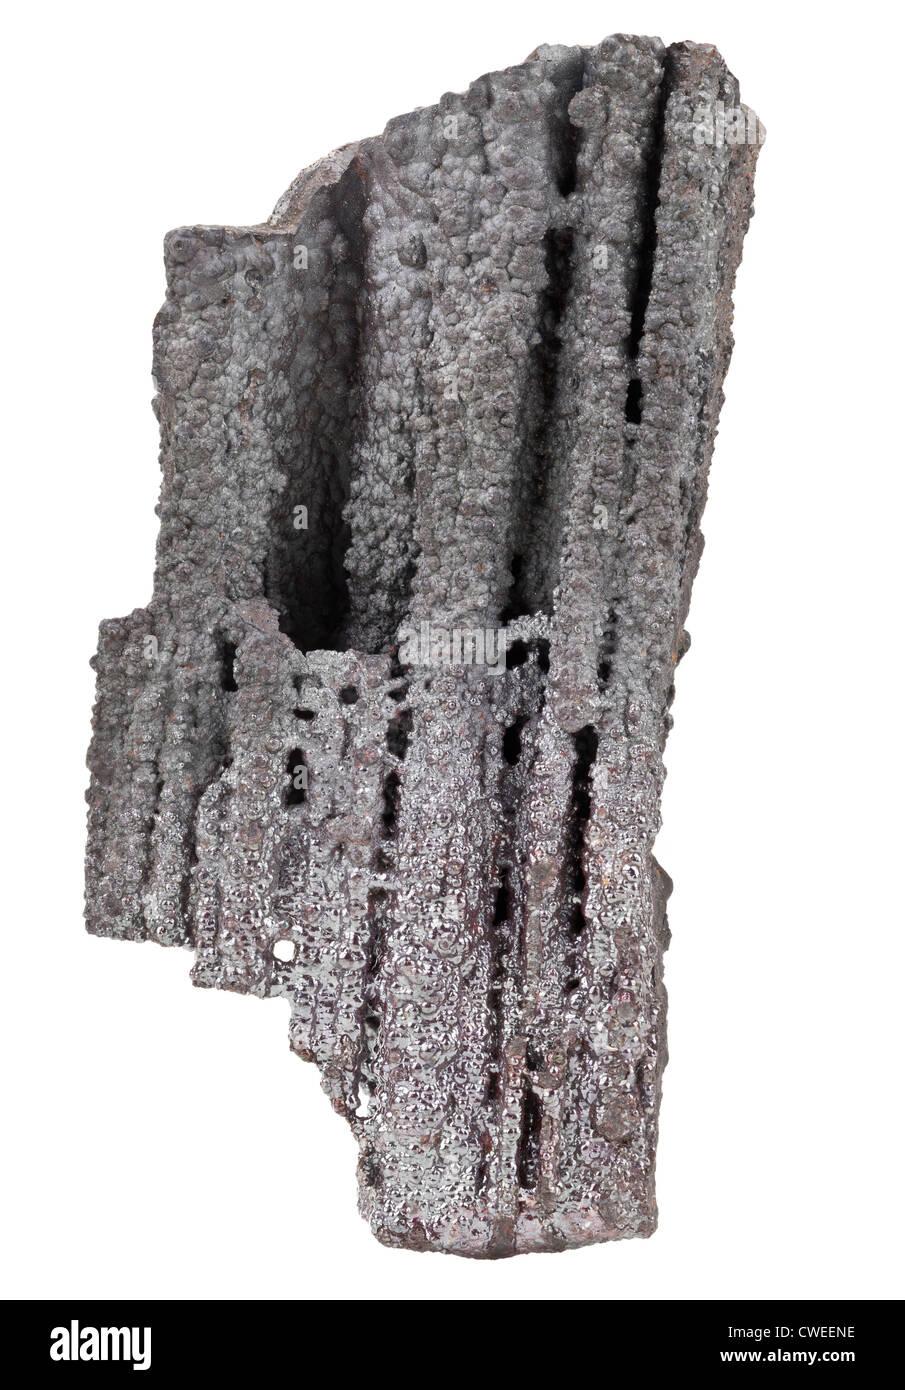 Goethite, Brown Iron Ore (FeO(OH)), Germany - Stock Image